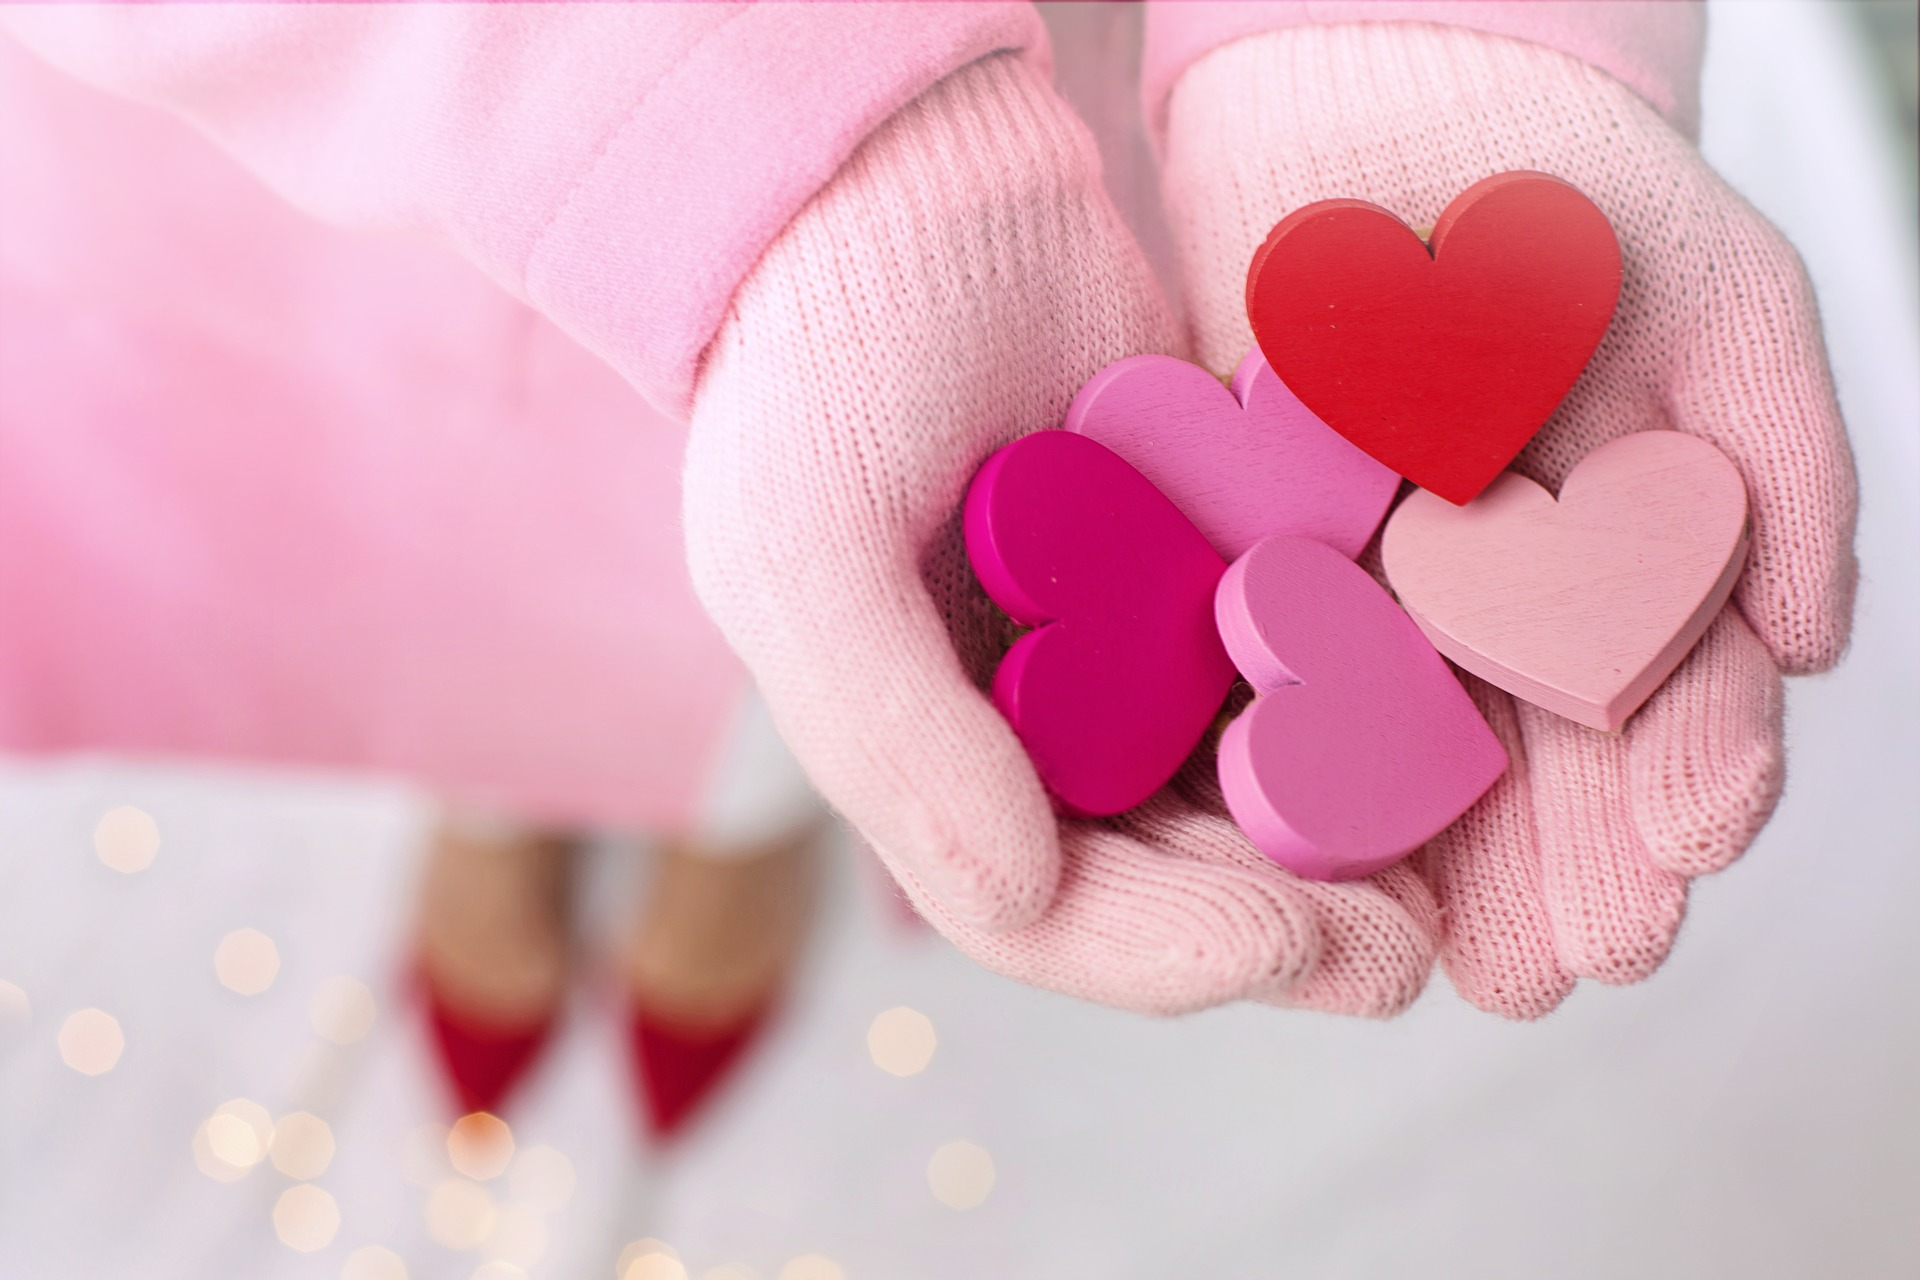 amour-offrir-son-coeur